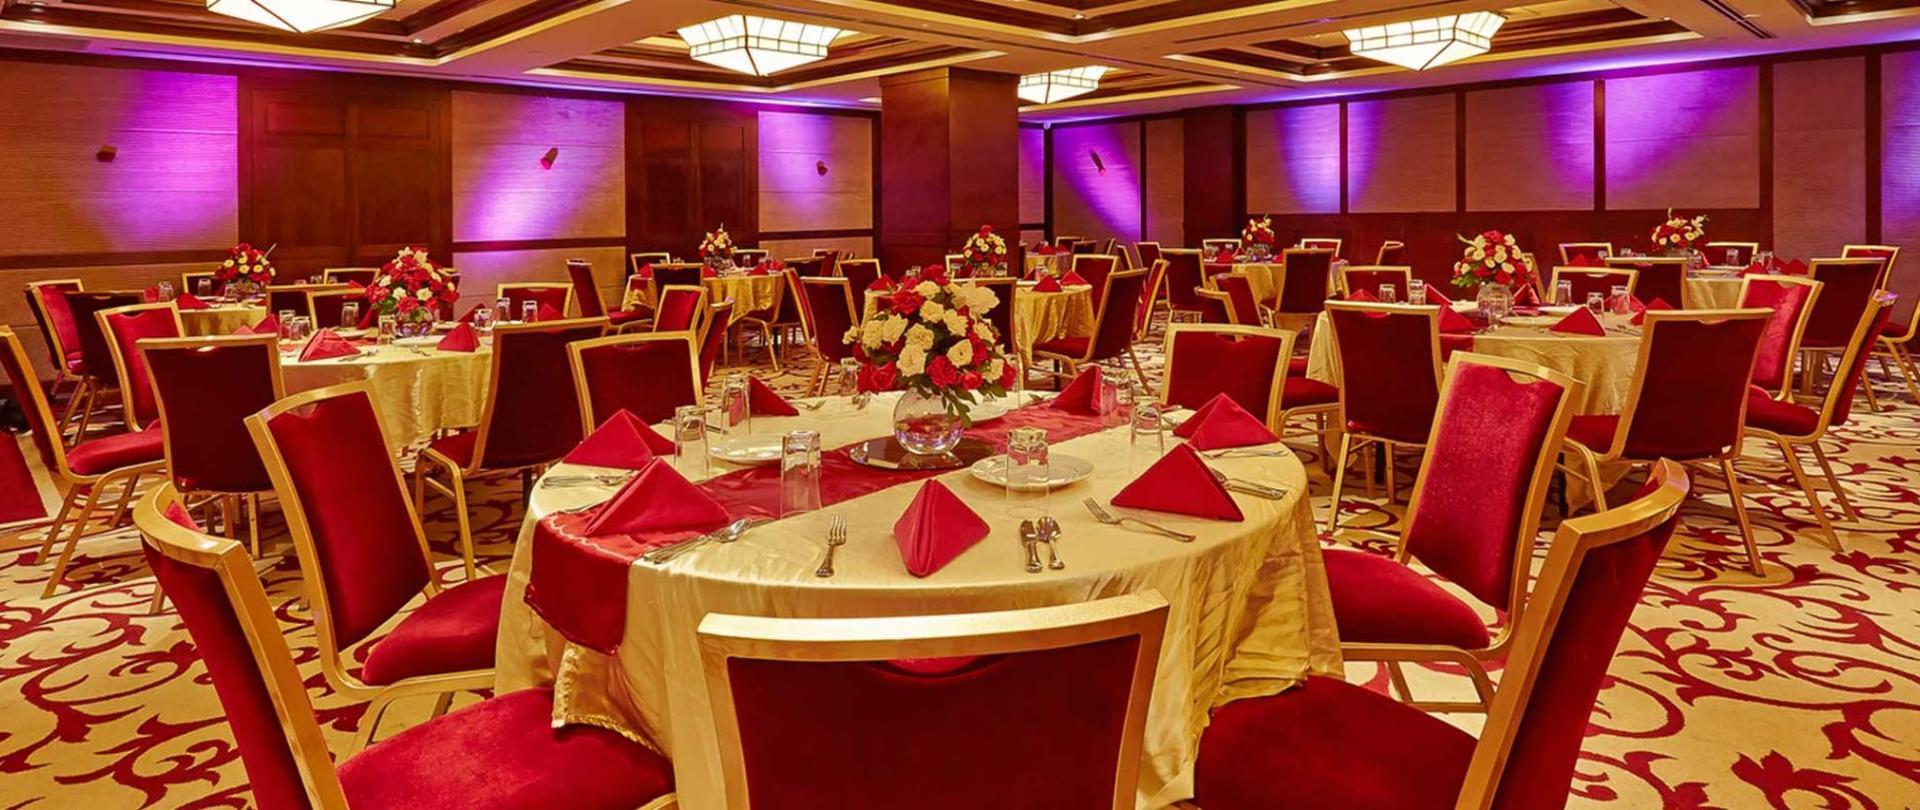 sixseasons-banquets.jpg